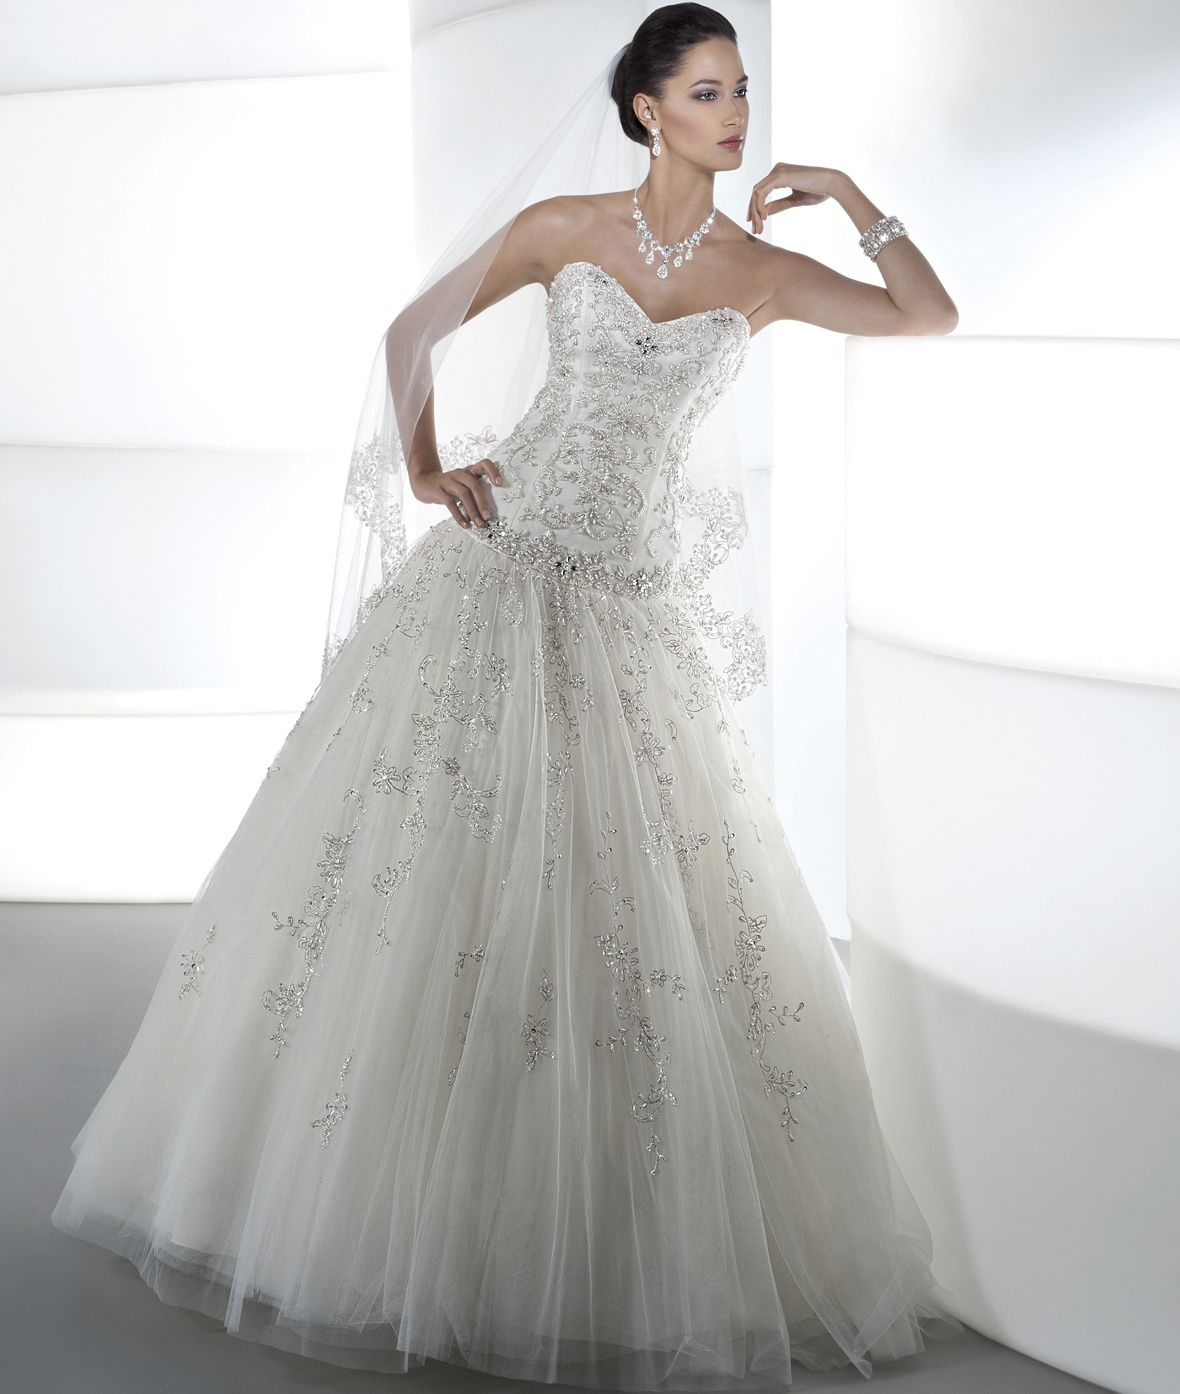 Demetrios White Drop Waist Ballgown With Beaded Bodice: Ilissa Style 534 By Demetrios In 2019